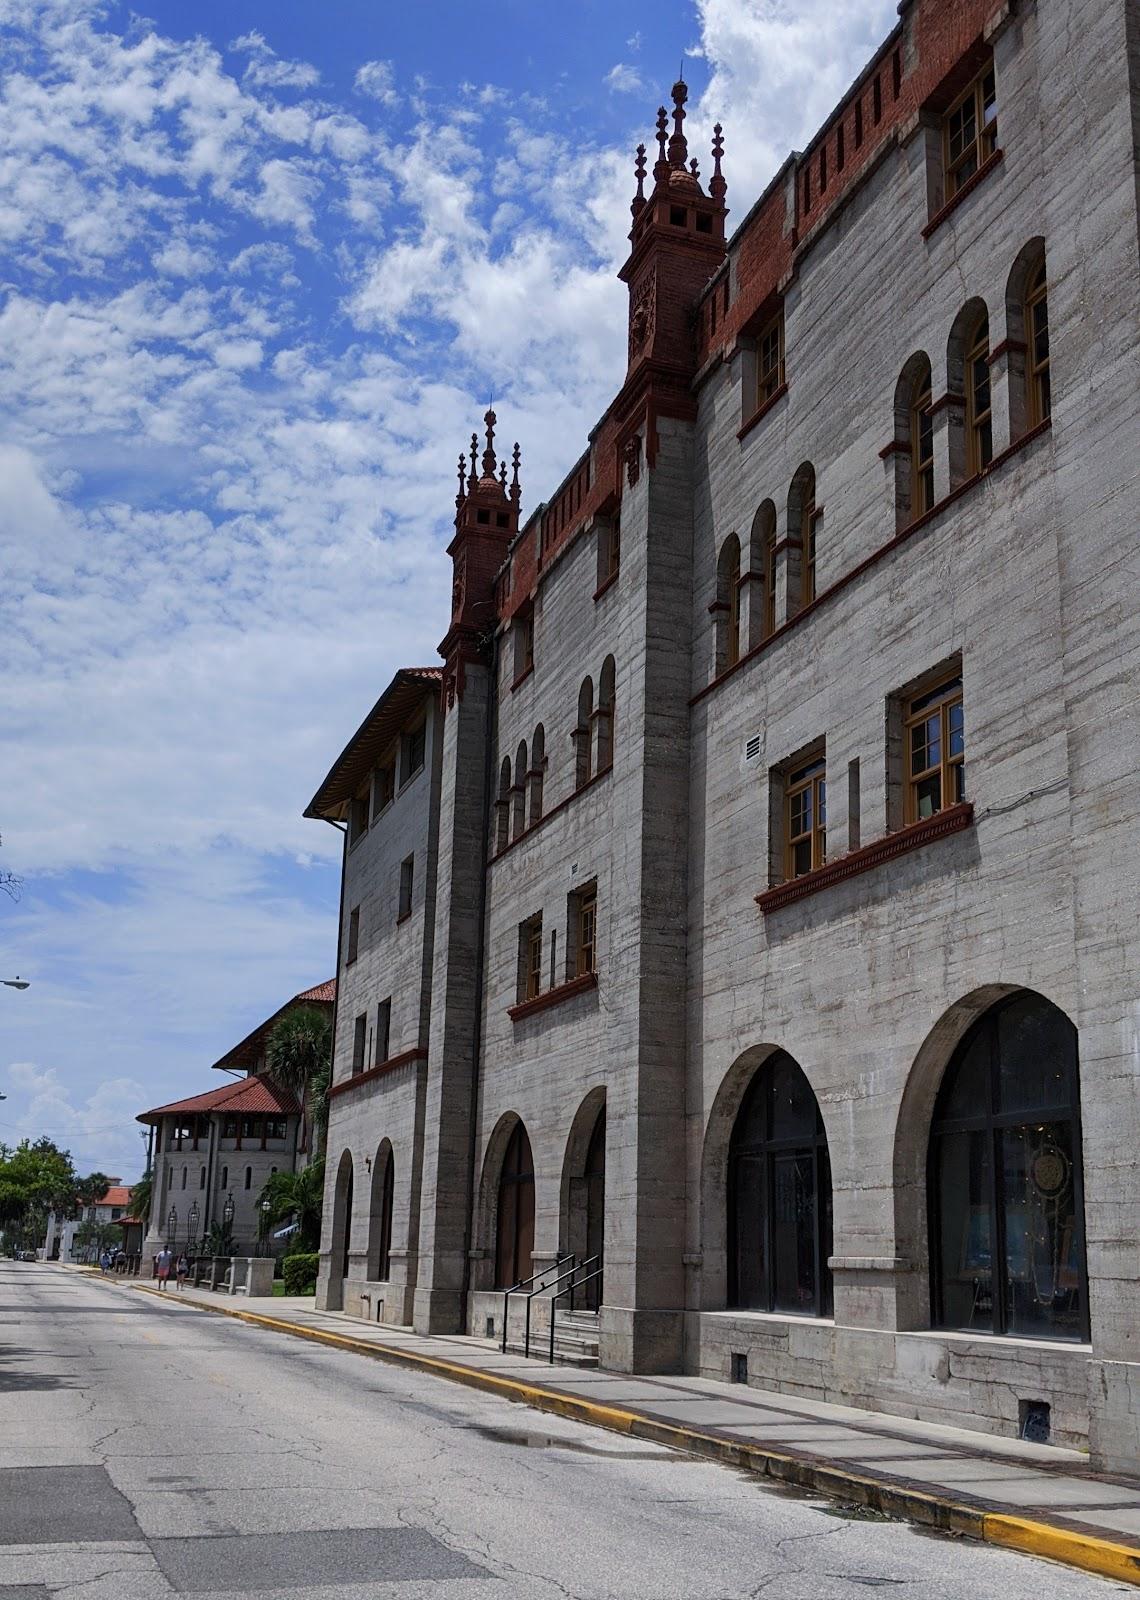 USA TRAVEL GUIDE WHERE TO GO ST. AUGUSTINE FLORIDA